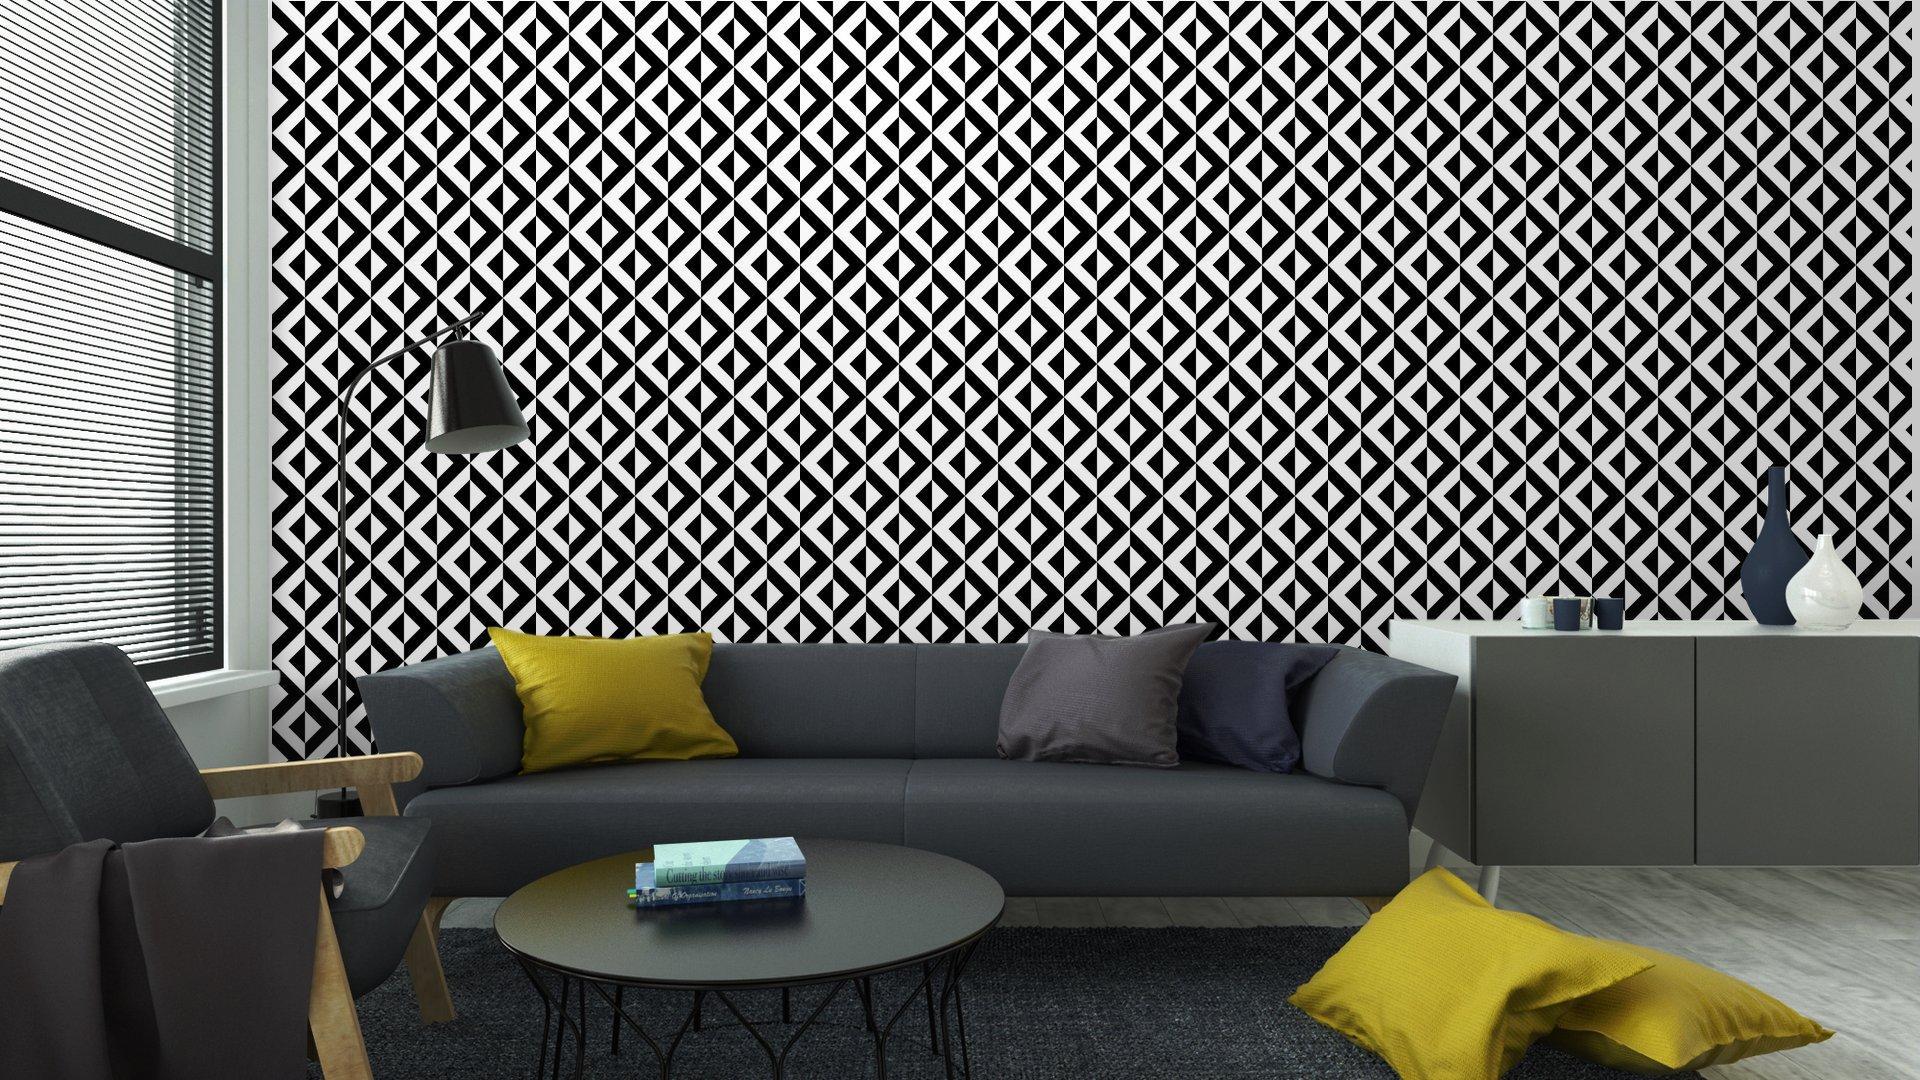 Fotomurales mexico papeles pintados patron geometrico abstracto 6 - Papel Tapiz Geométrico Blanco y Negro 01